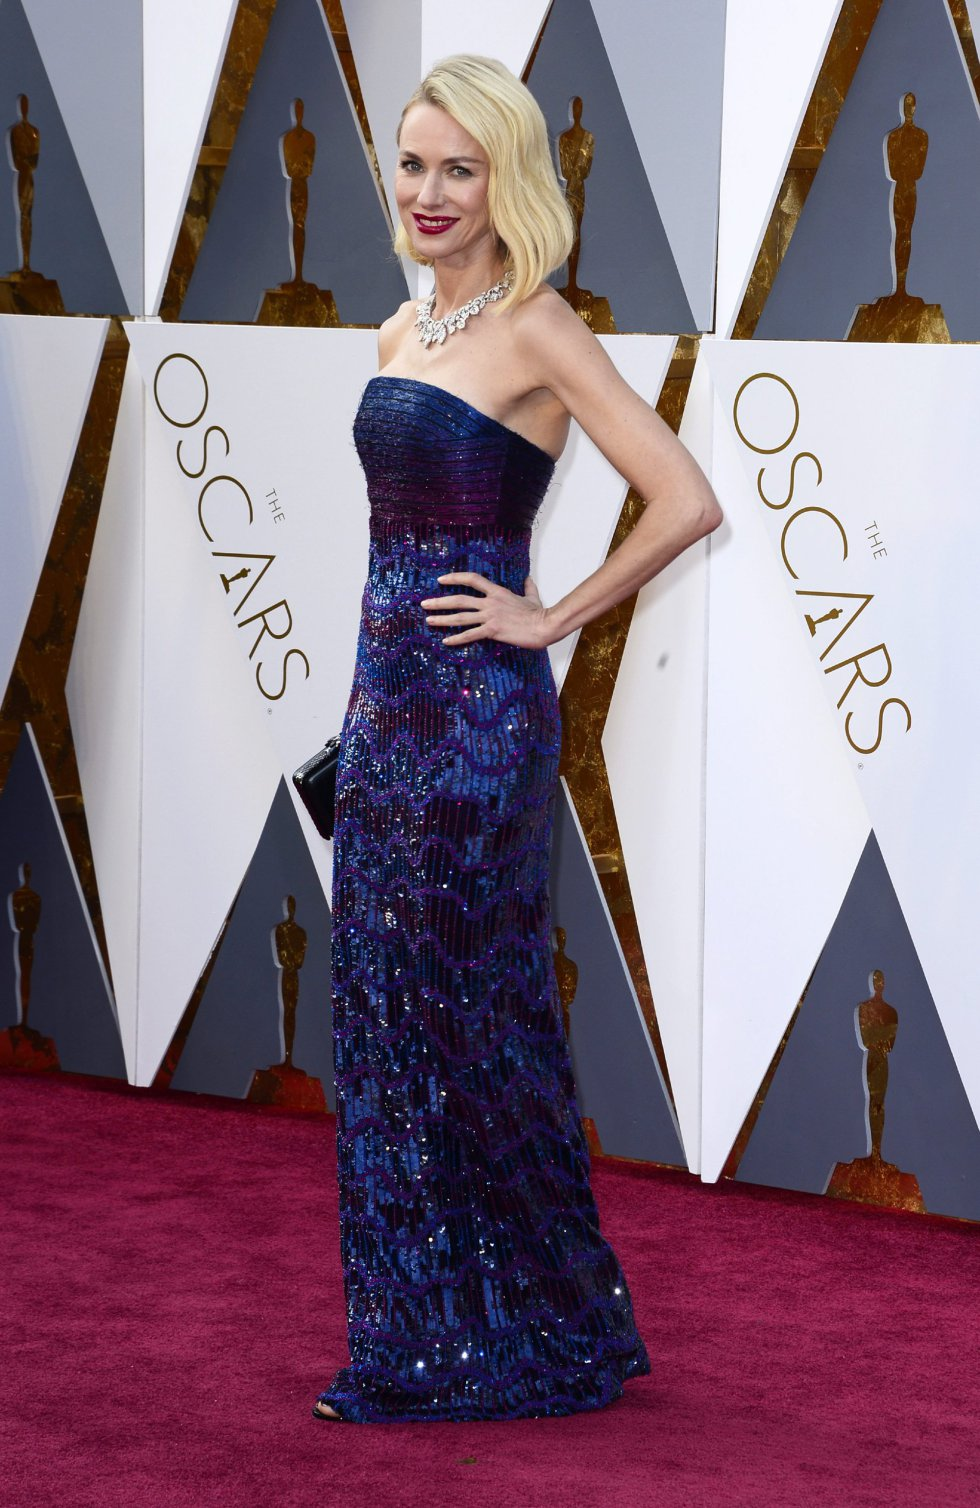 La actriz Naomi Watts